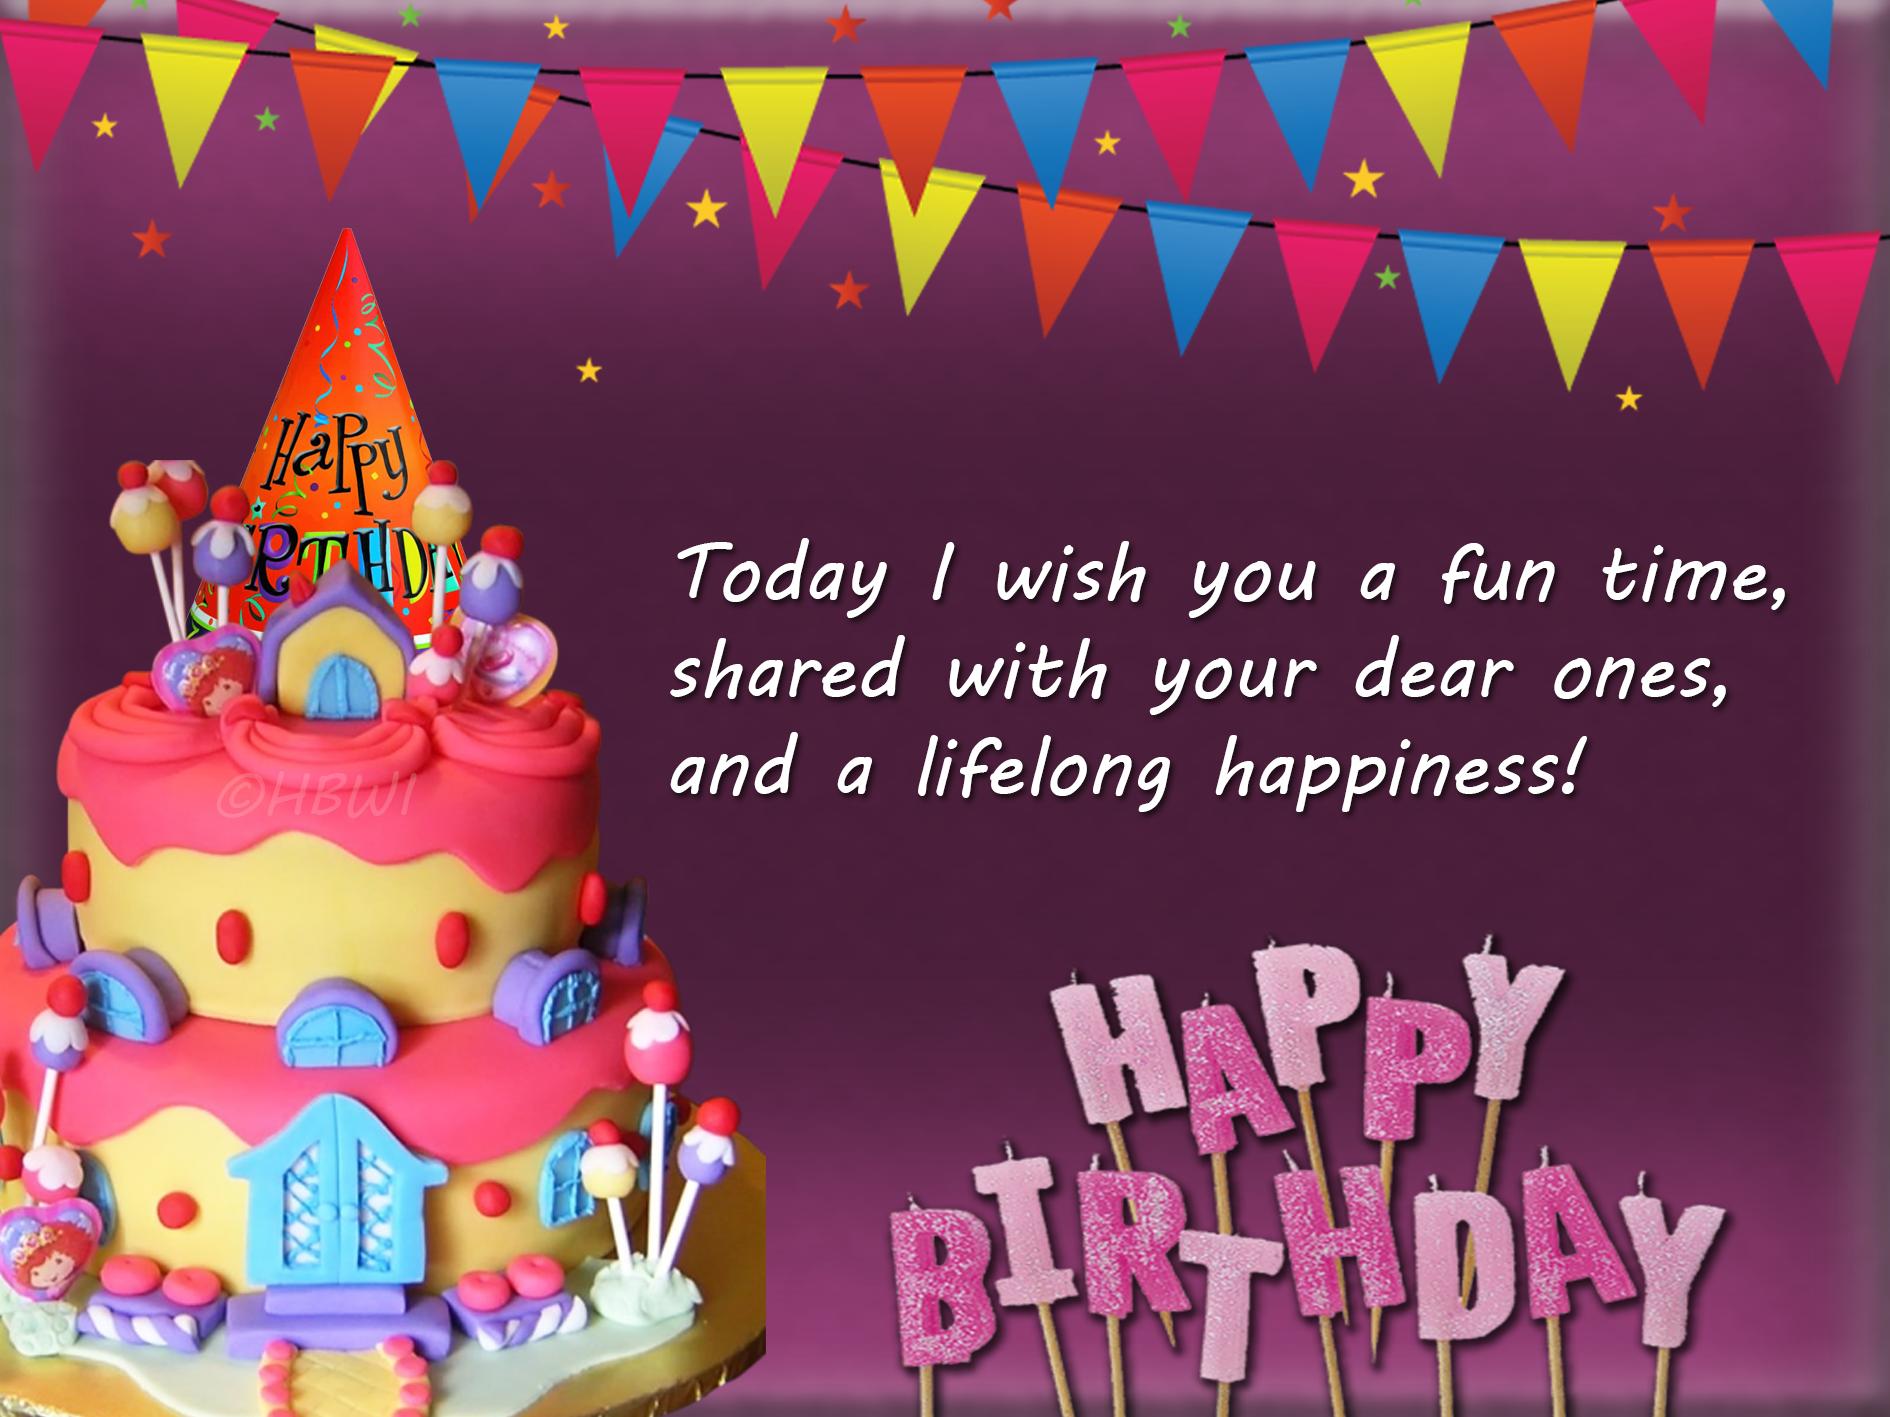 4k 4kwallpapers Birthday Free Hd Hdwallpapers Wallpapers Funny Happy Birthday Images Happy Birthday Wishes Images Happy Birthday Wishes